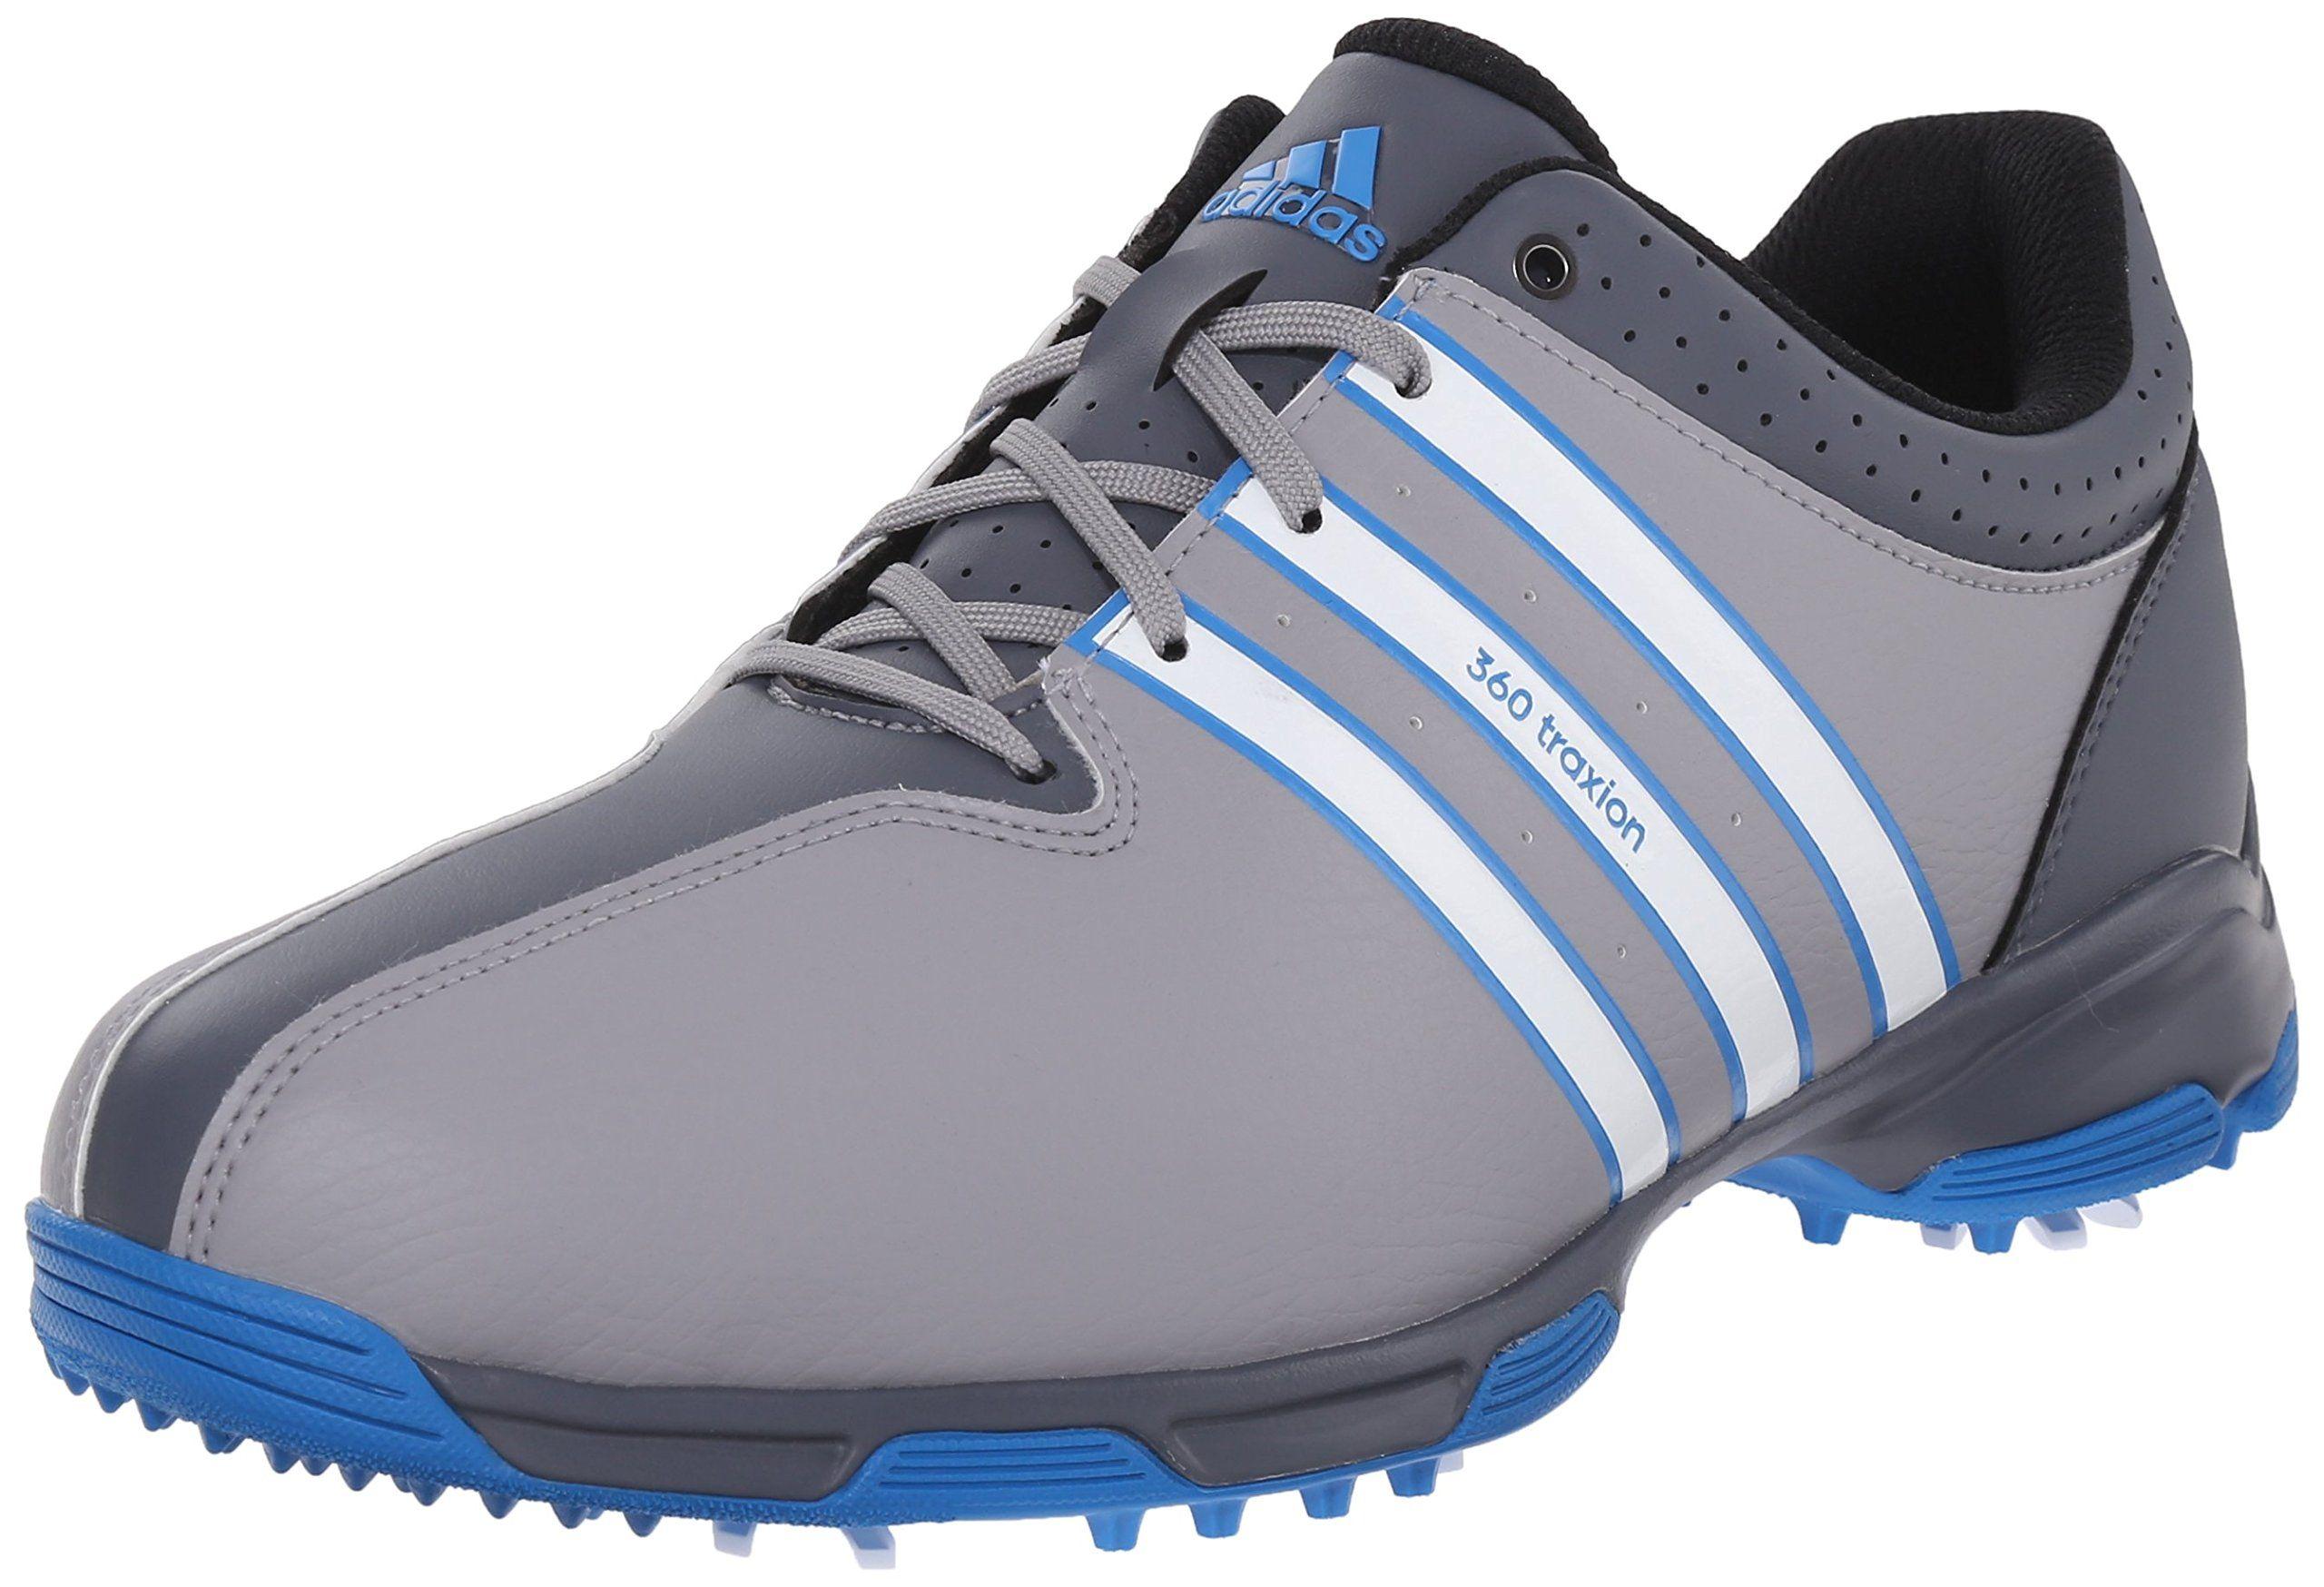 0daaebebb6e014 adidas Men s 360 Traxion NWP Golf Cleated